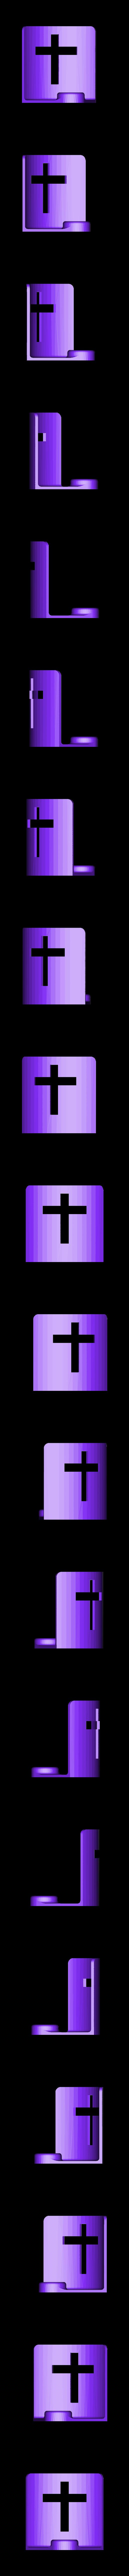 candelabro de cruz 2.STL Download free STL file Cross Candle Holder • 3D print object, memoretirado